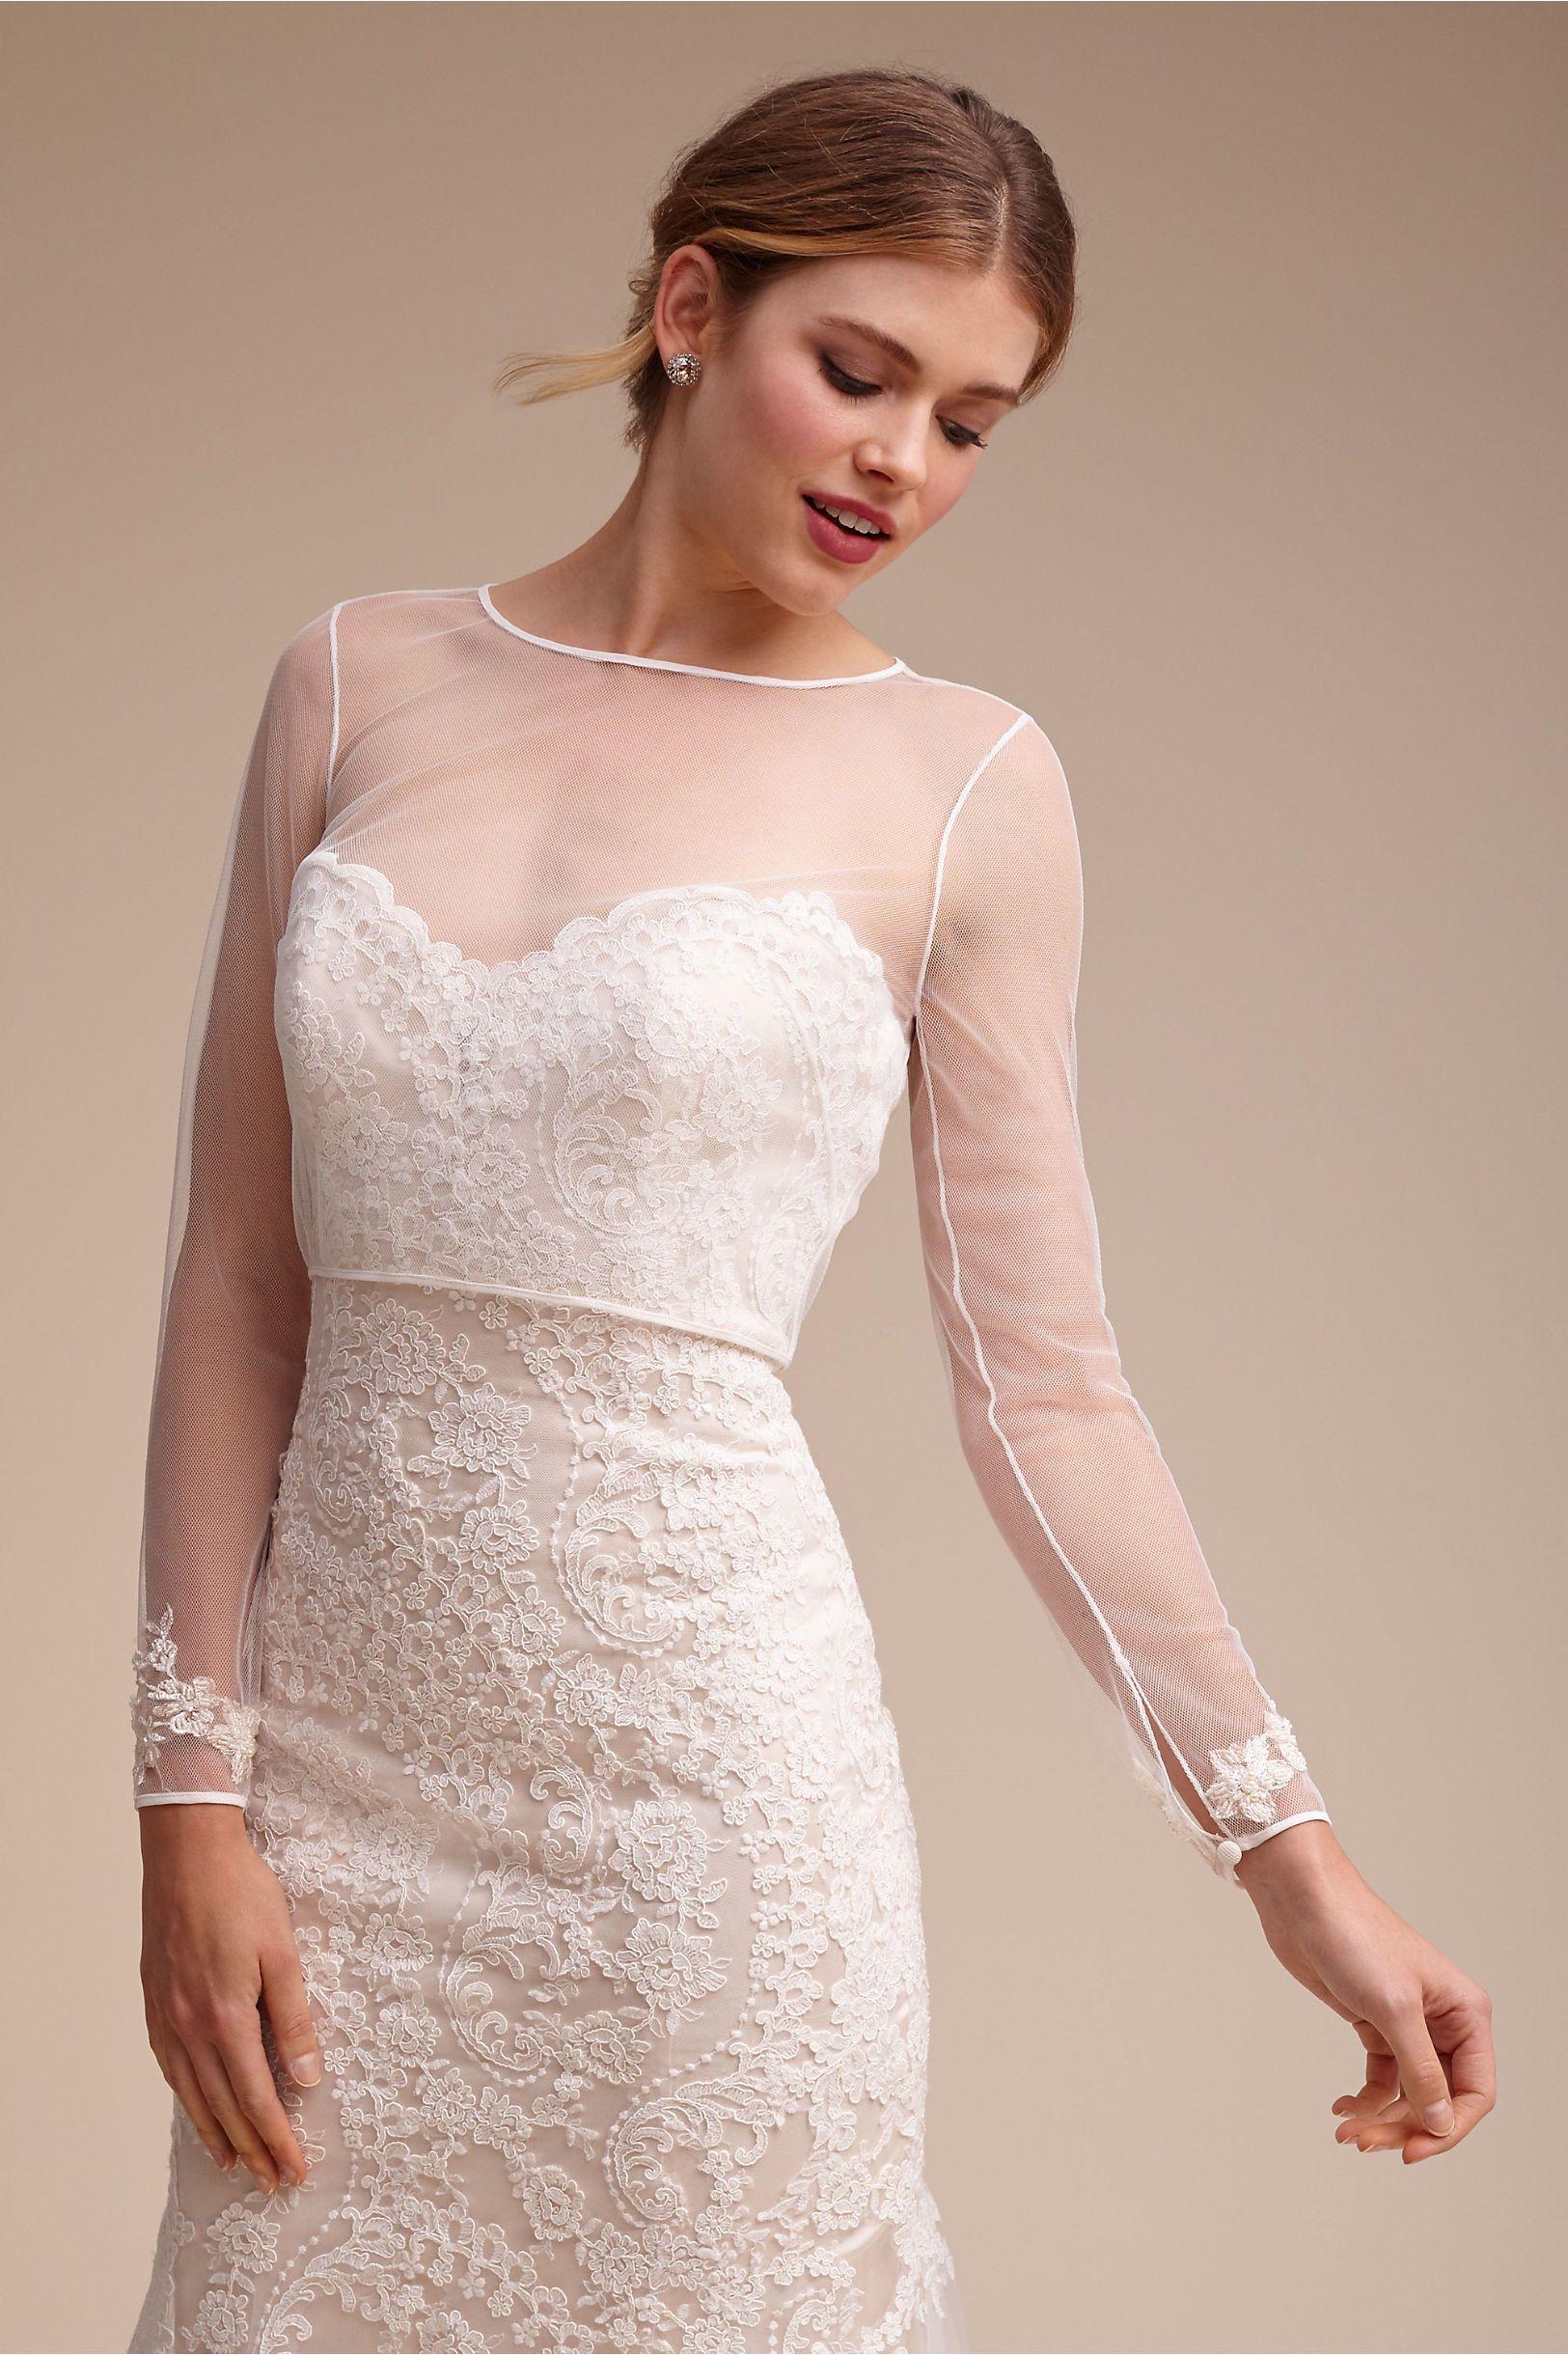 d26fac761e853 BHLDN's Dreams by Eddy K Leigh Gown in Ivory/cream | Bridal ...